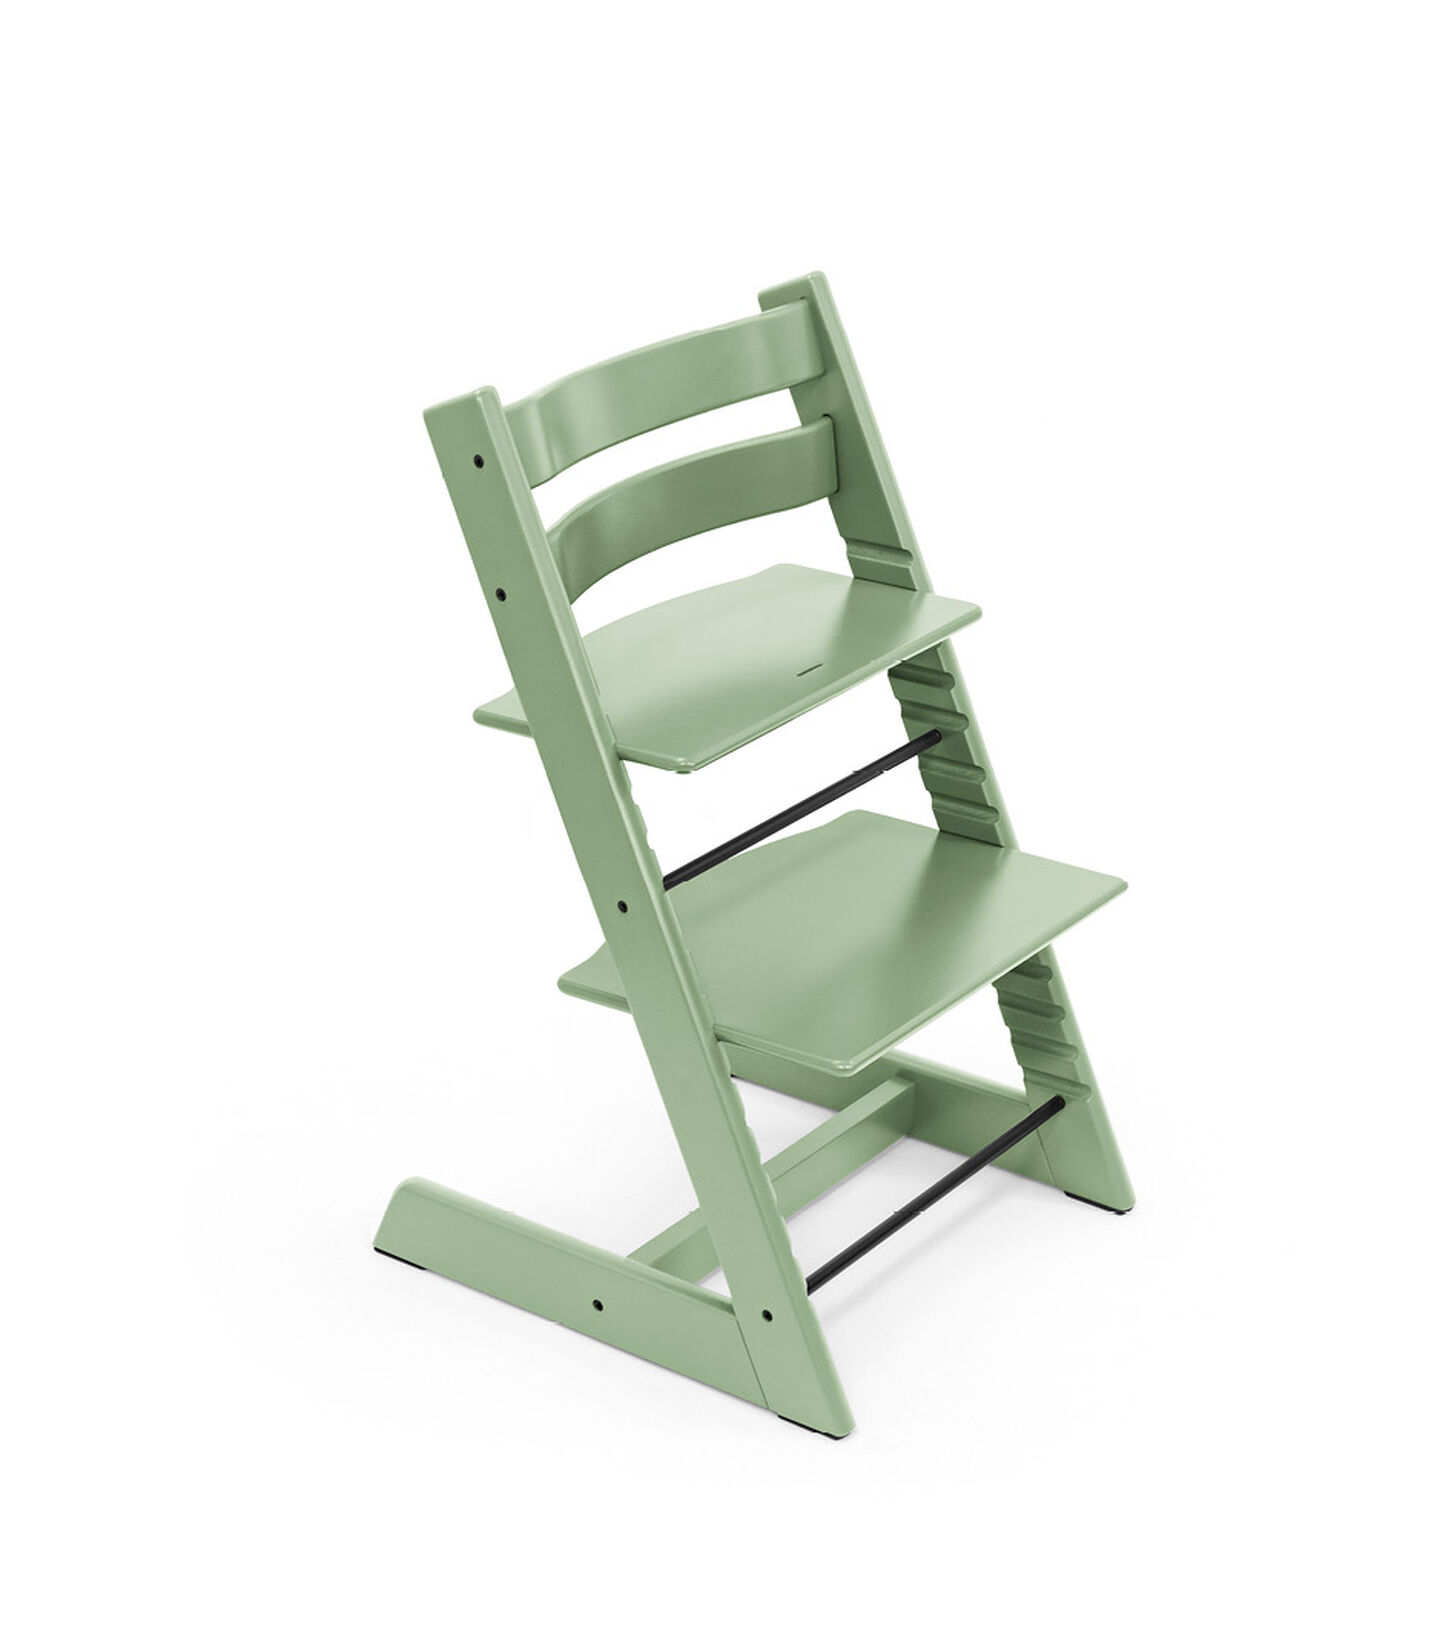 Tripp Trapp® Chair Moss Green, Moss Green, mainview view 1